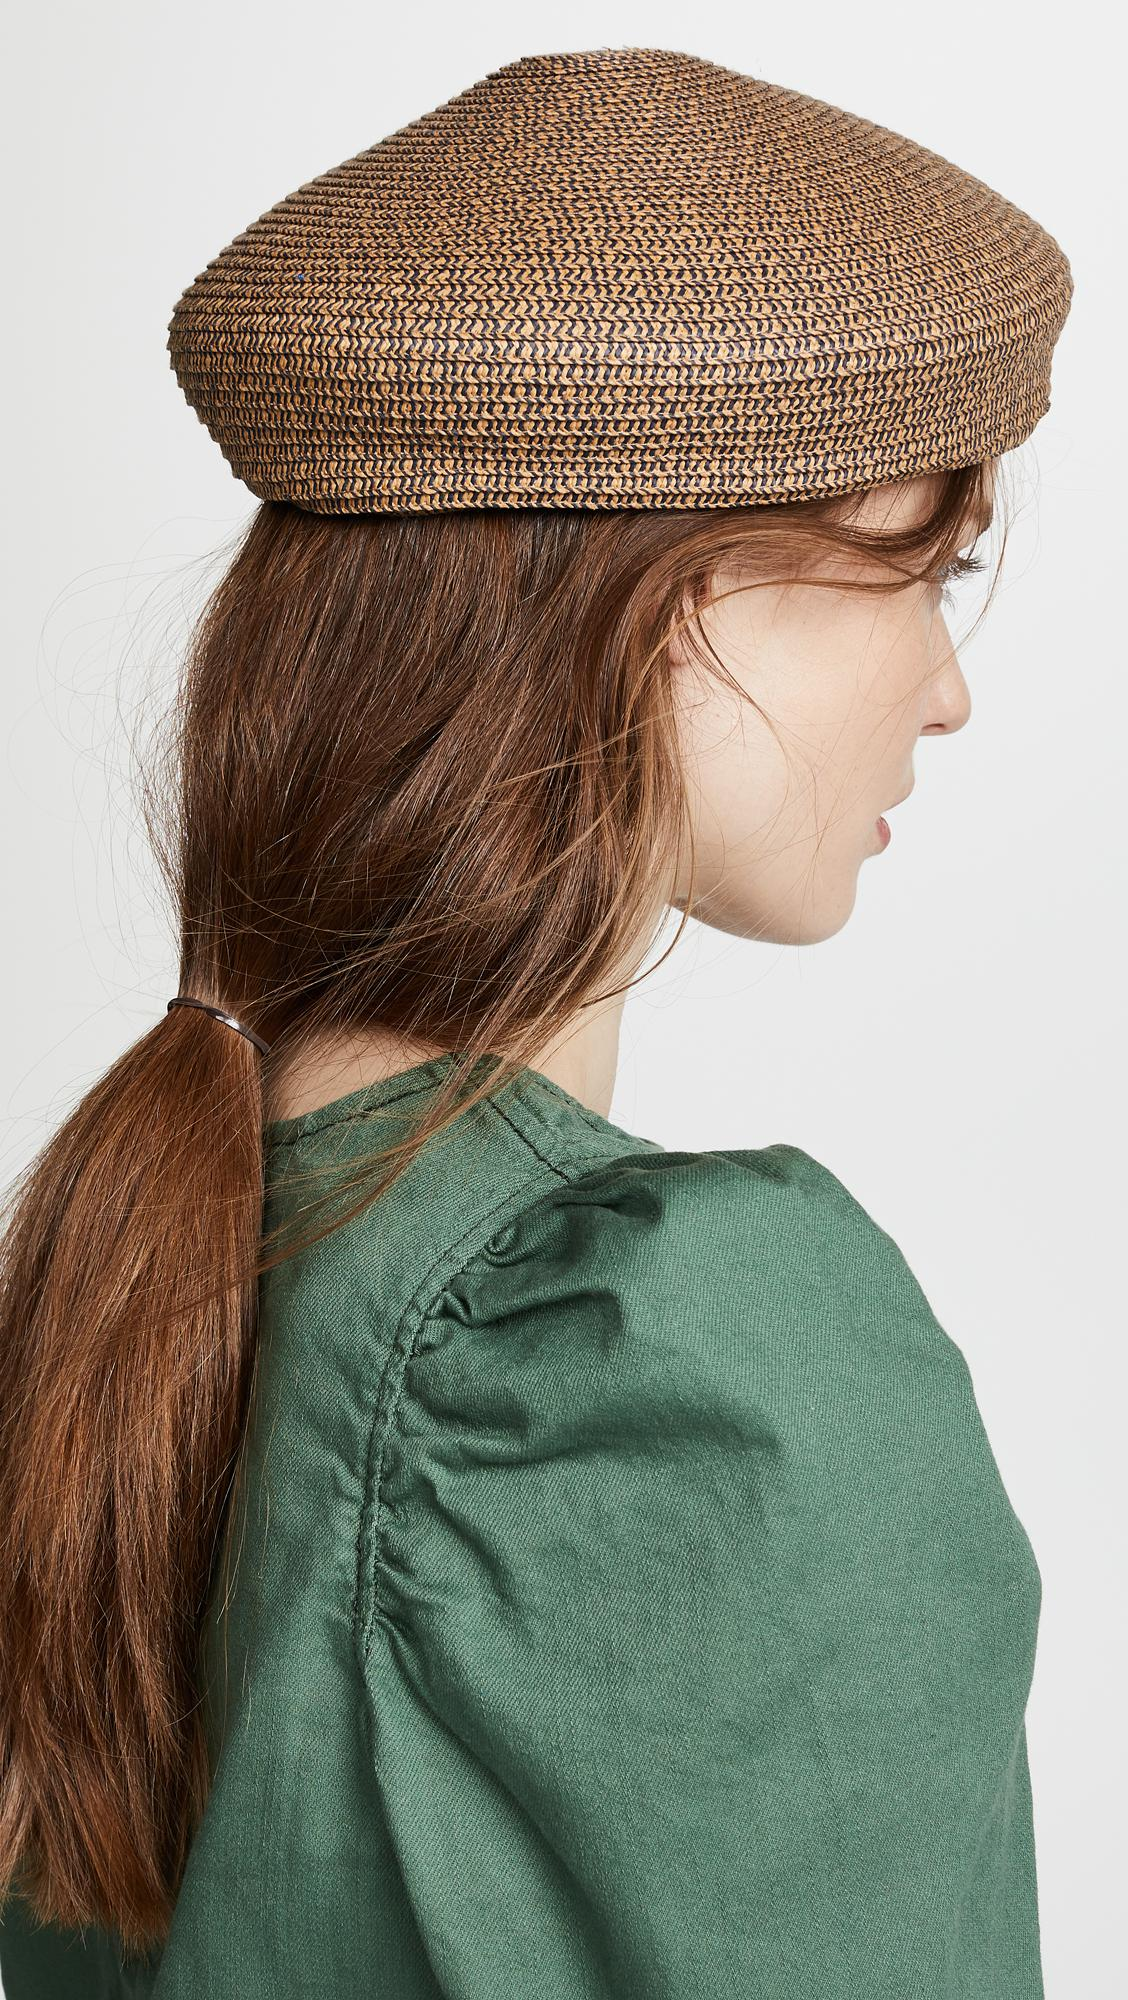 Lyst - Brixton Audrey Beret Hat in Green 409f32eccd61